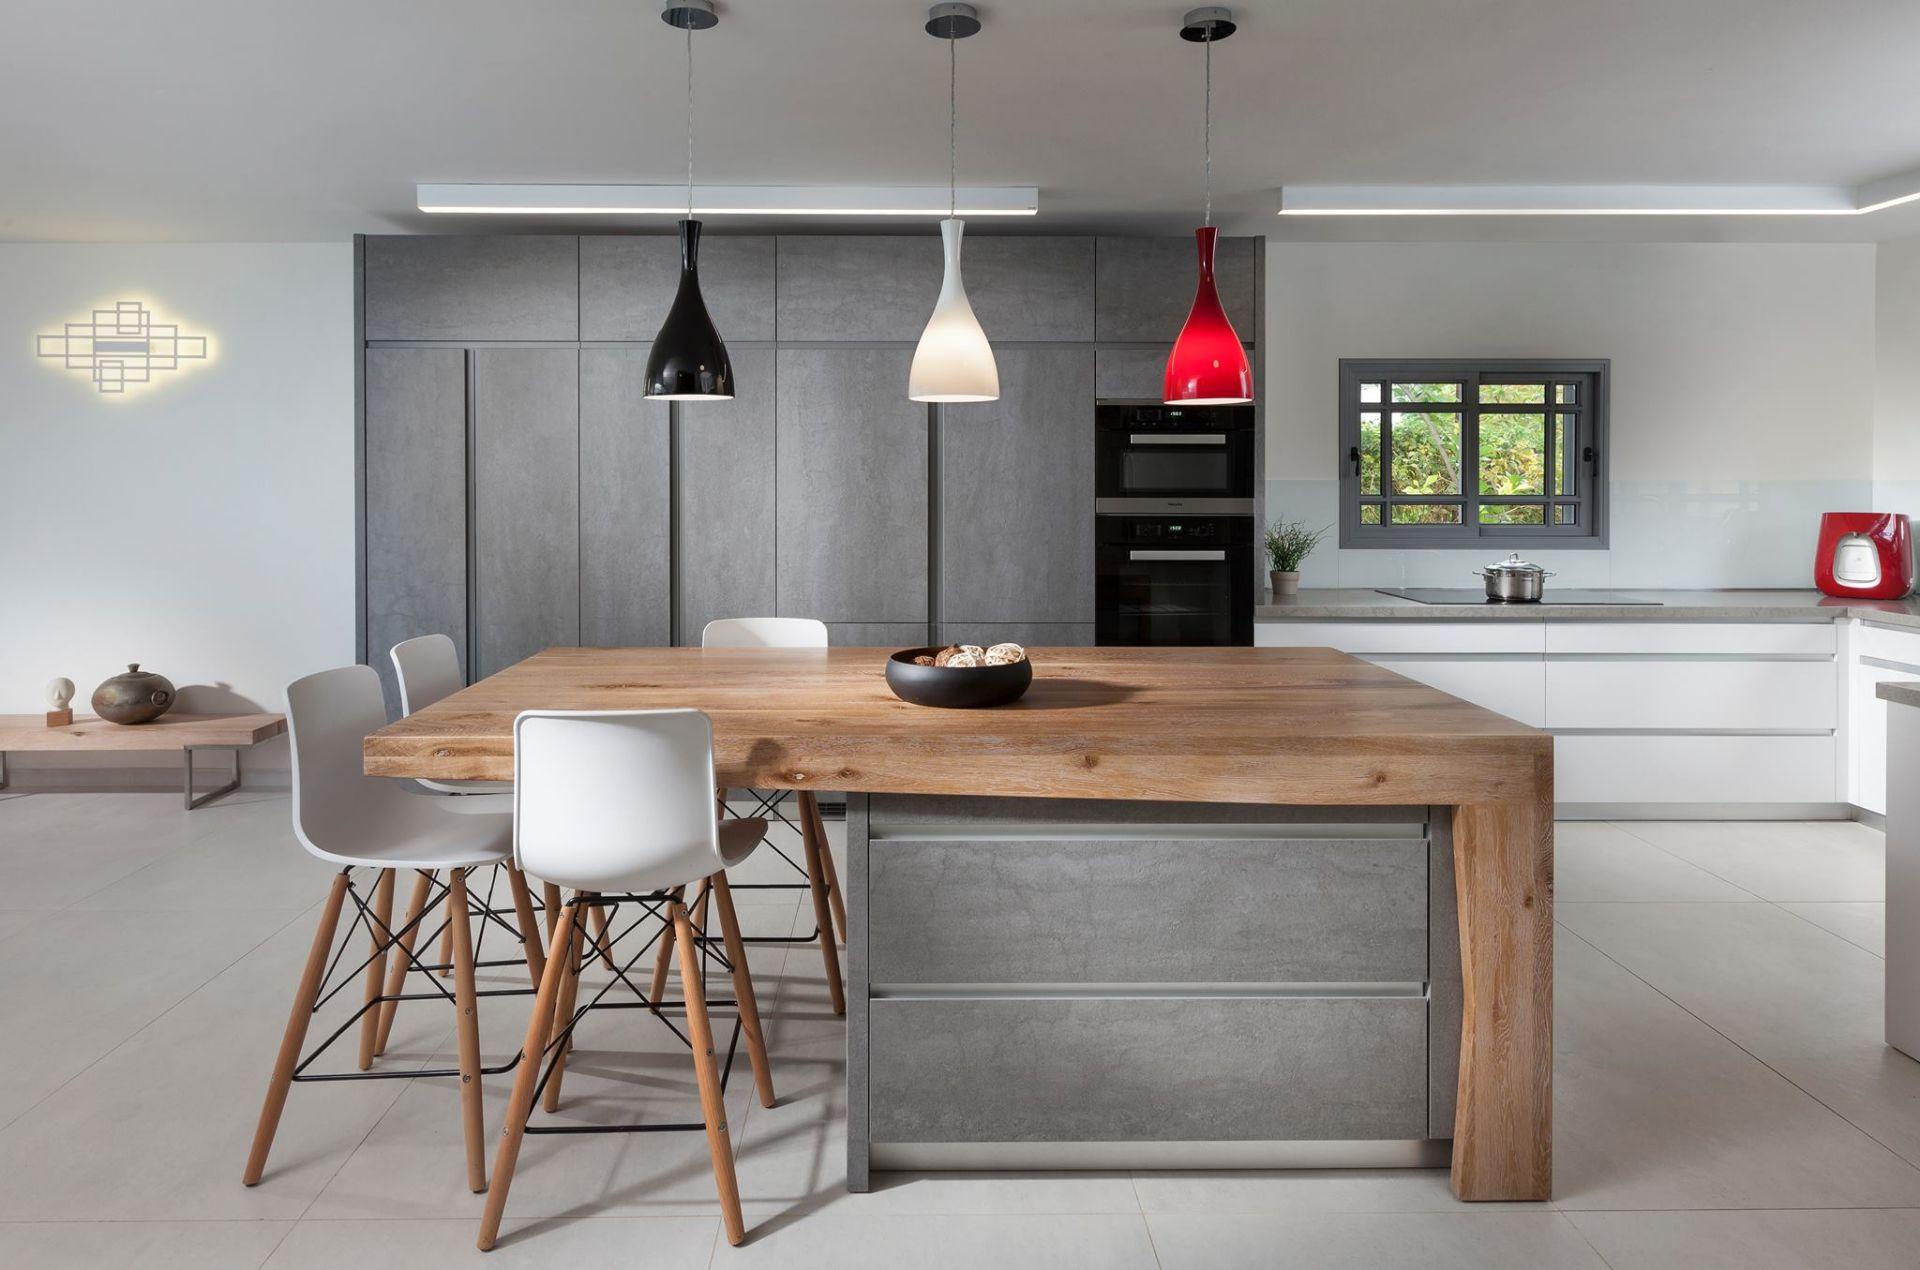 cob-led-kitchen